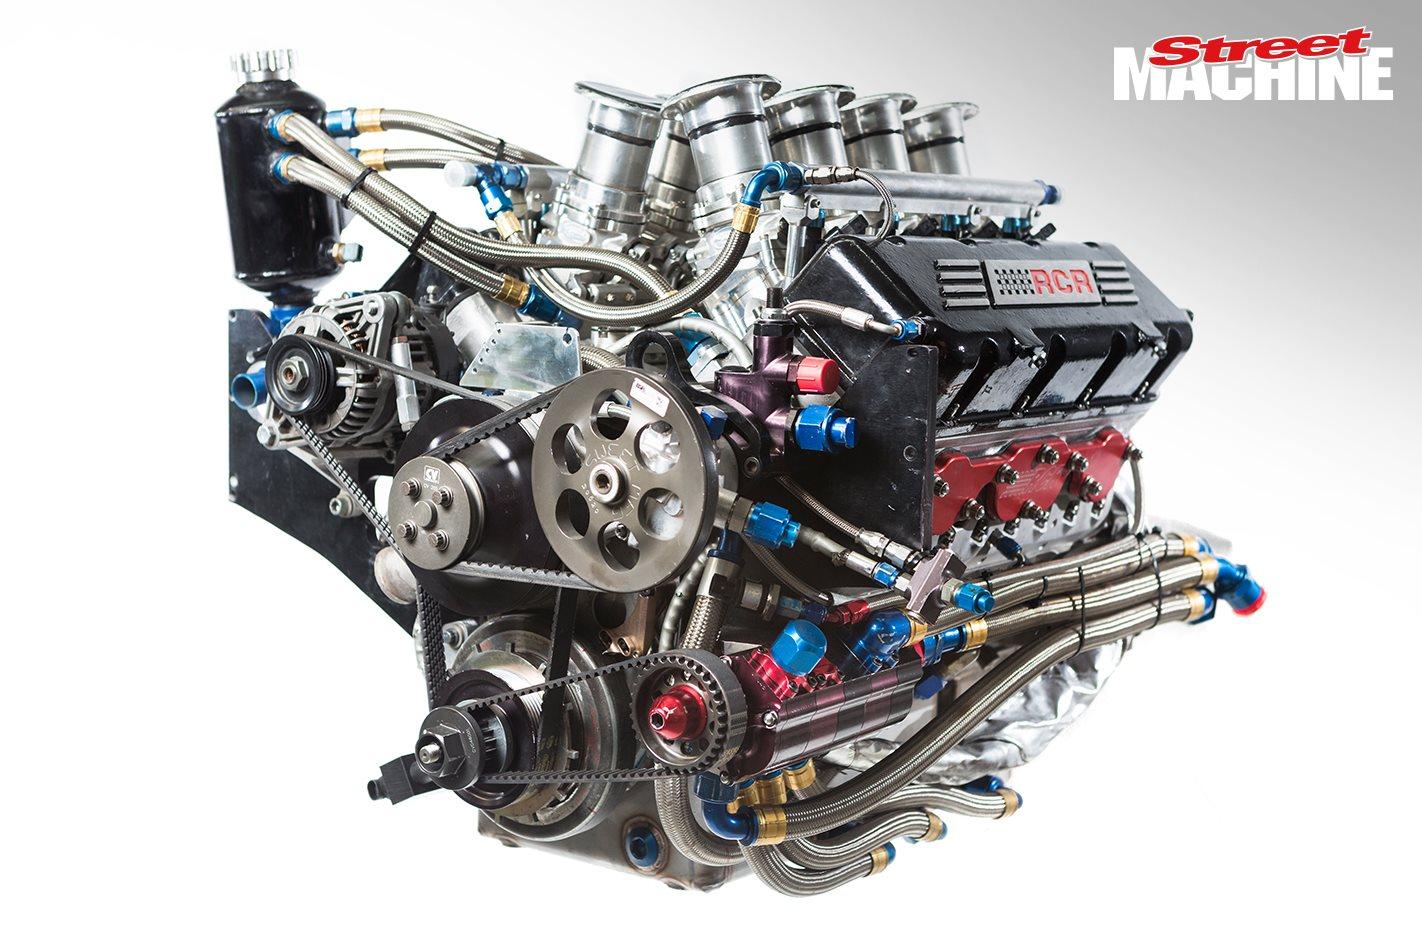 Nascar Engine Specs >> 800hp 356ci Gm Nascar Engine